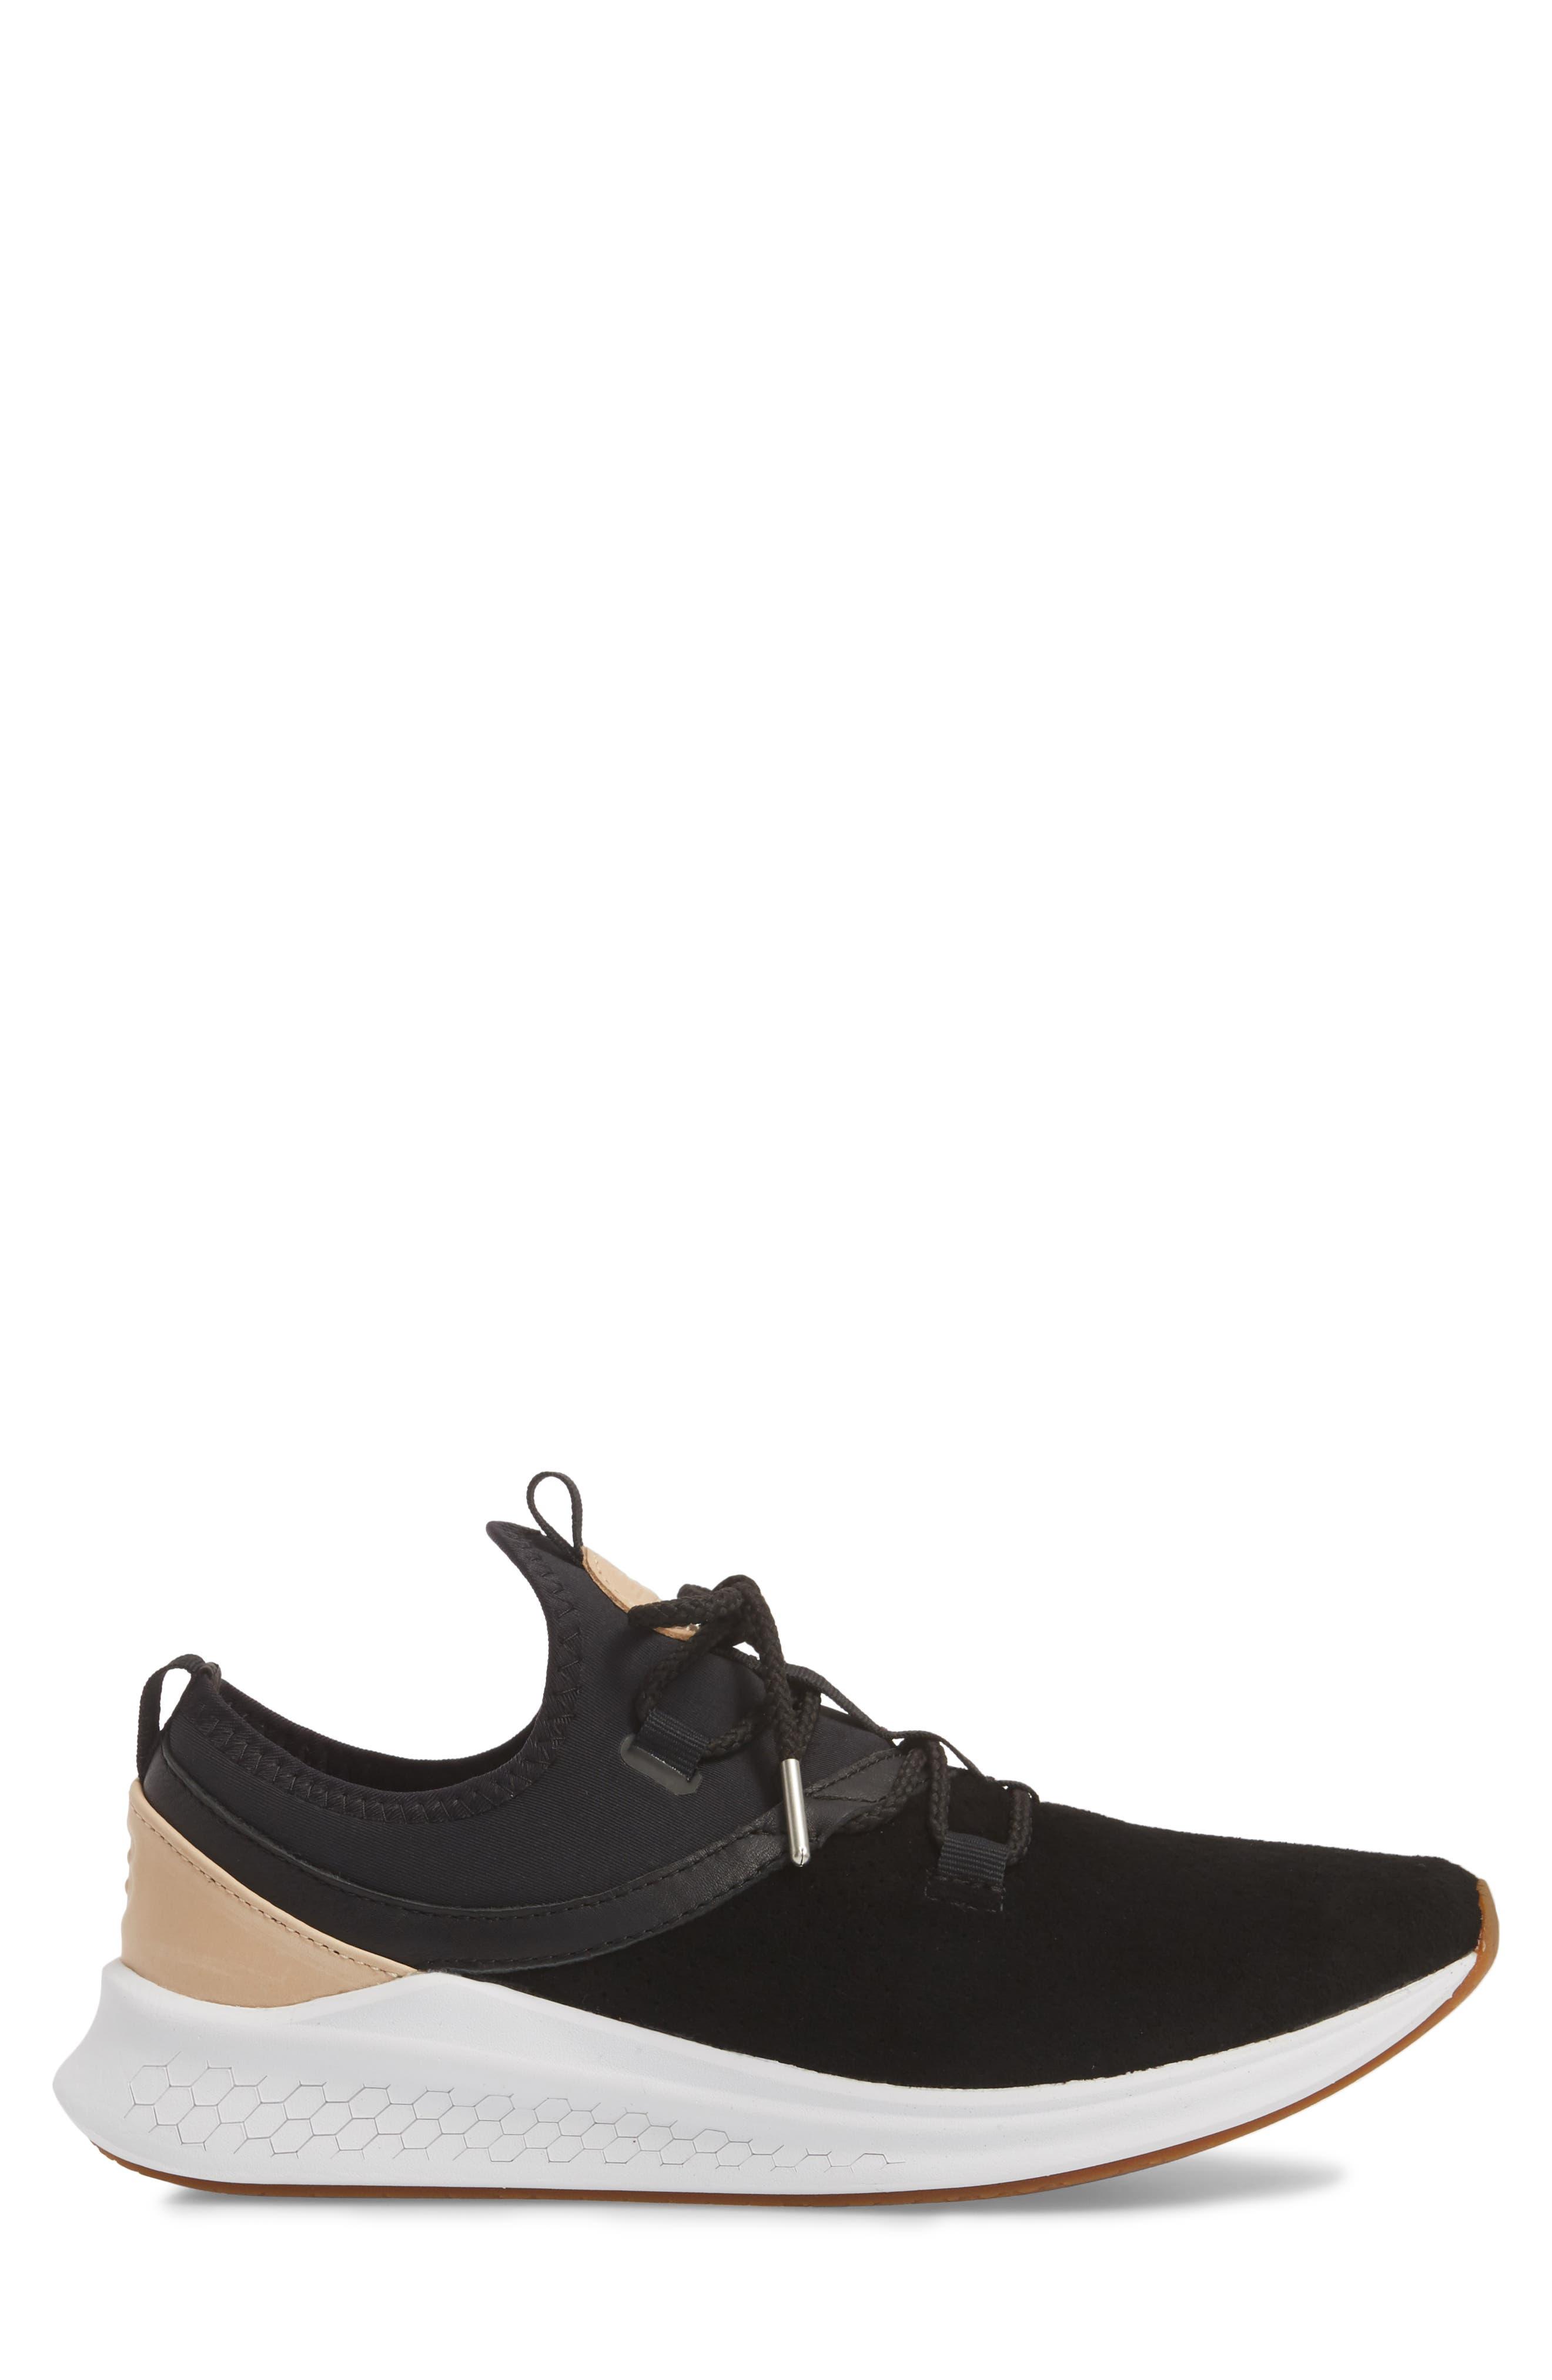 Fresh Foam Laser Luxe Sneaker,                             Alternate thumbnail 3, color,                             001